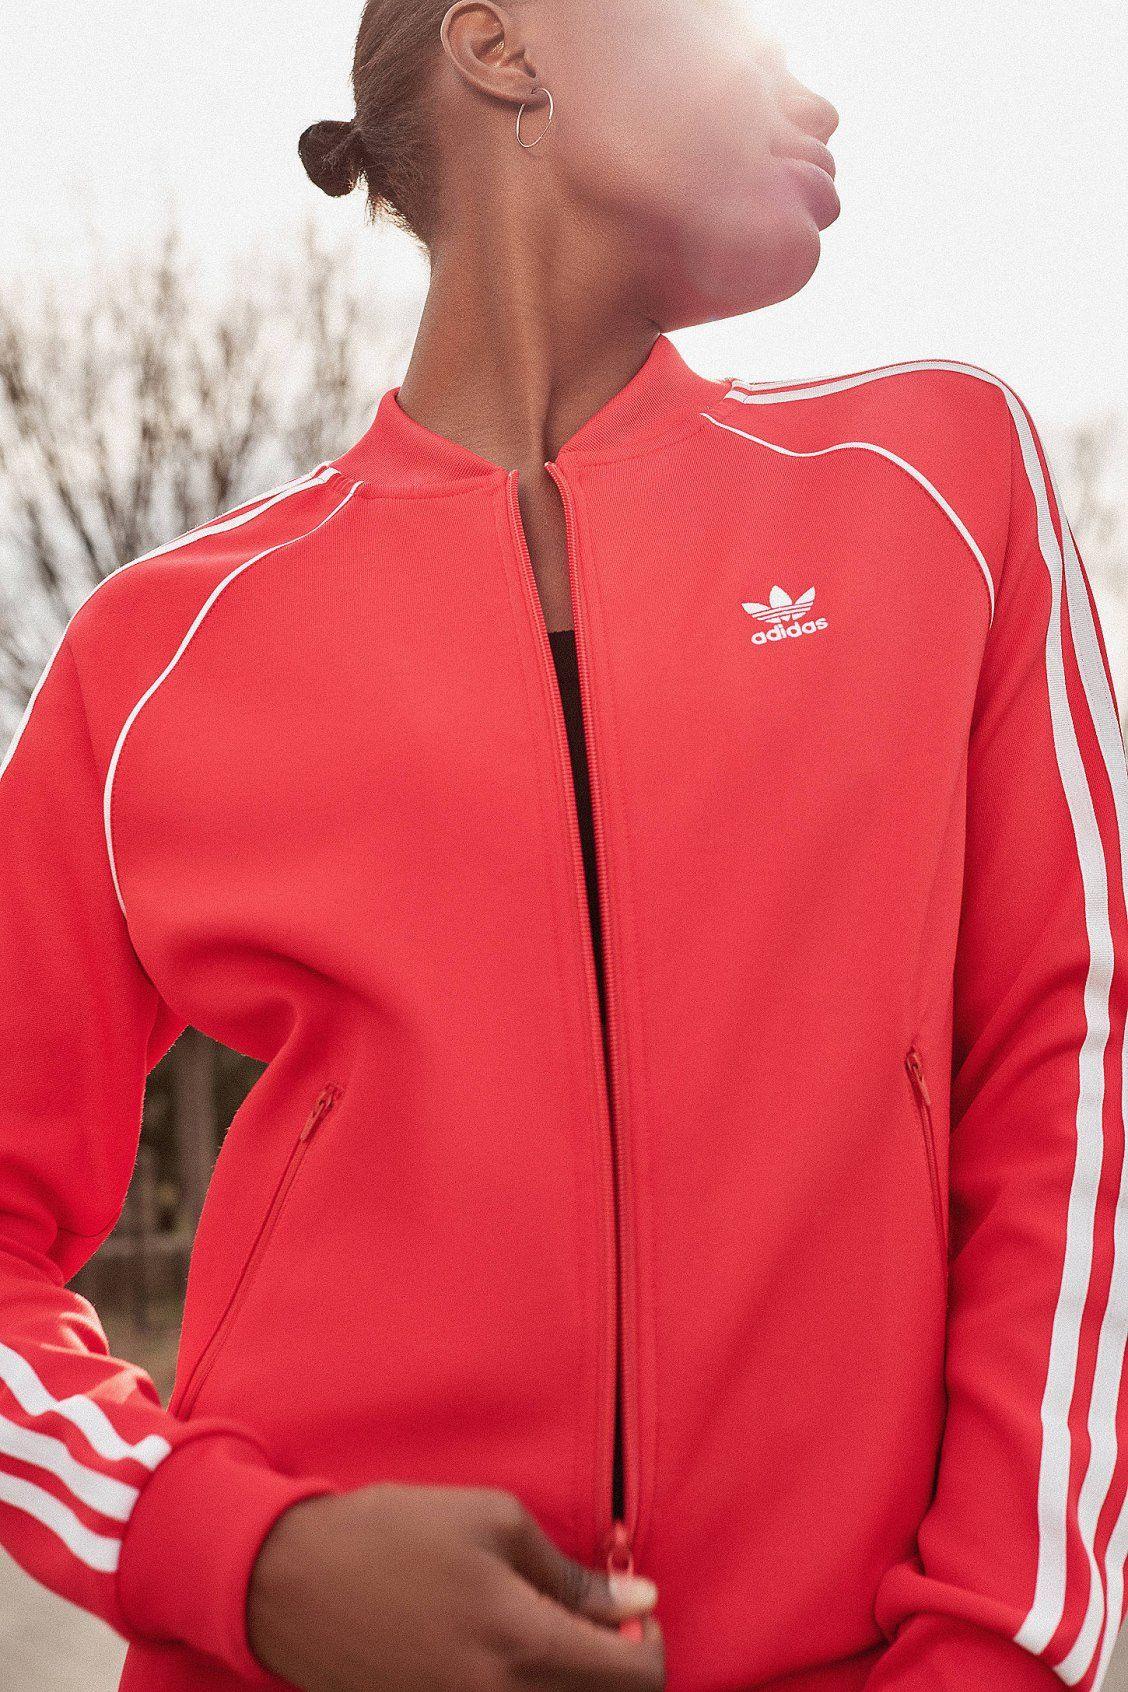 adidas Originals Superstar Trefoil Track Jacket | Adidas